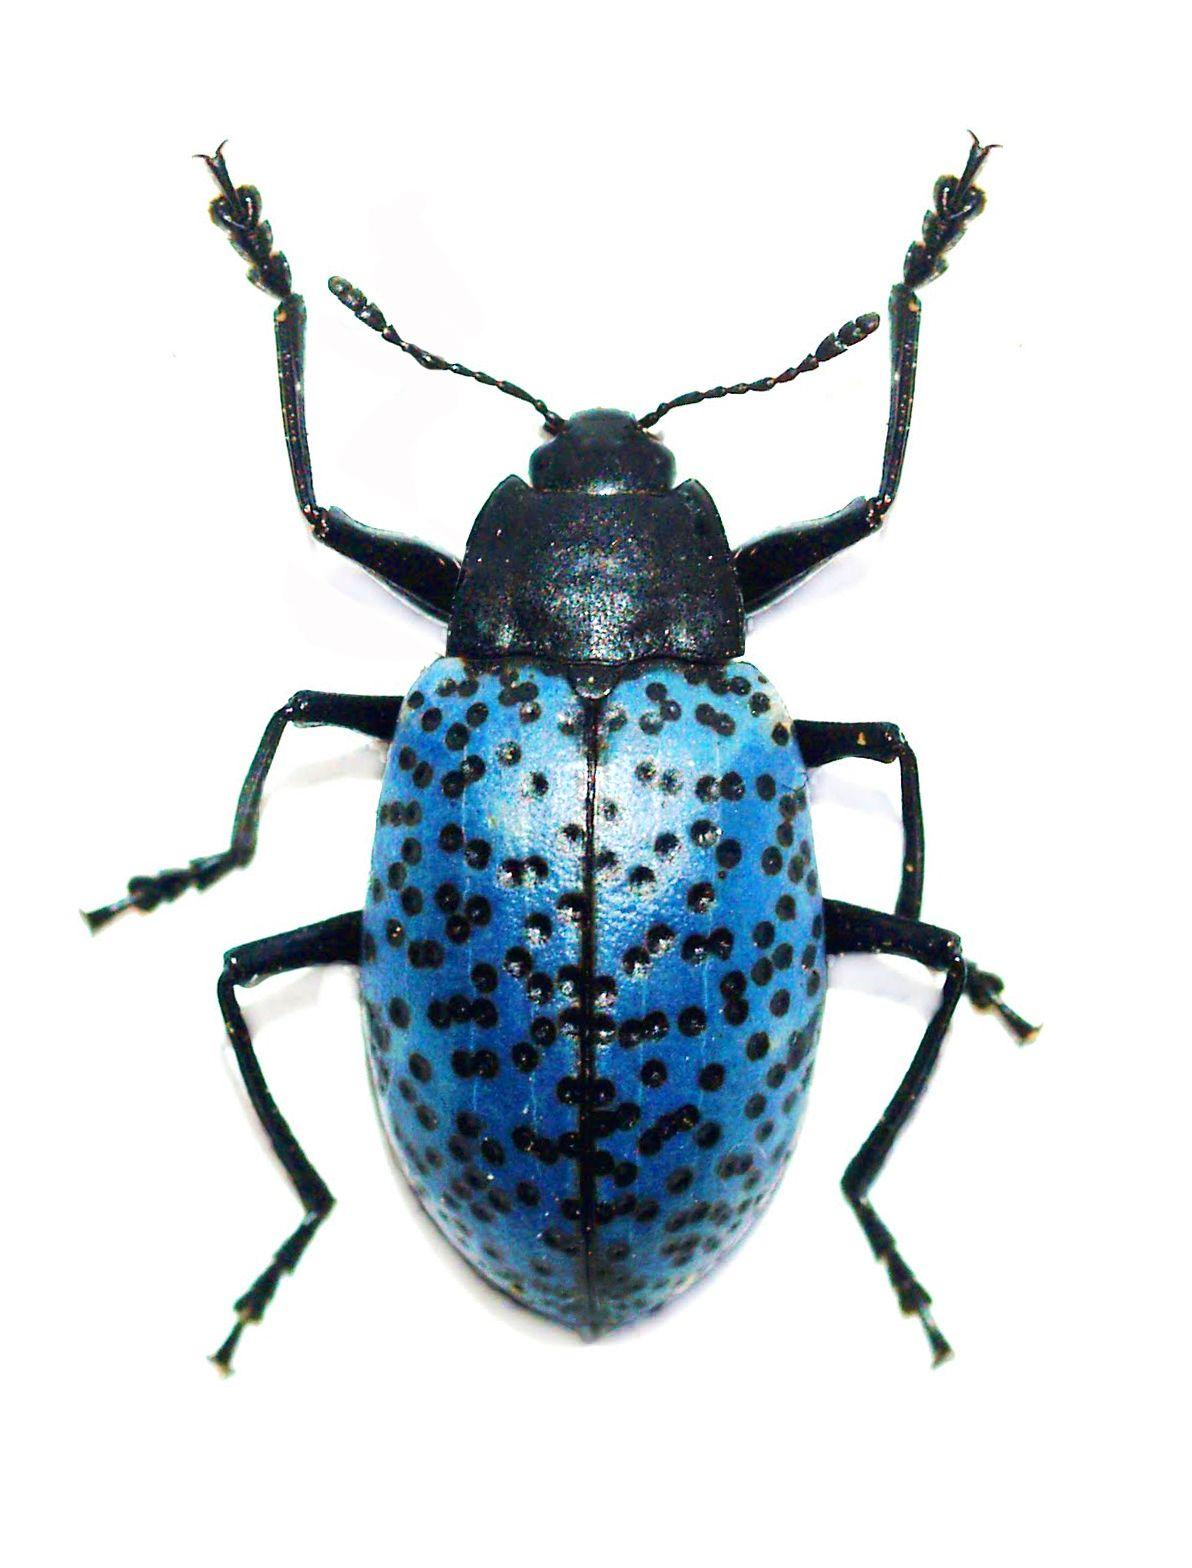 What ate my Smart Wool shirt larval carpet beetles How